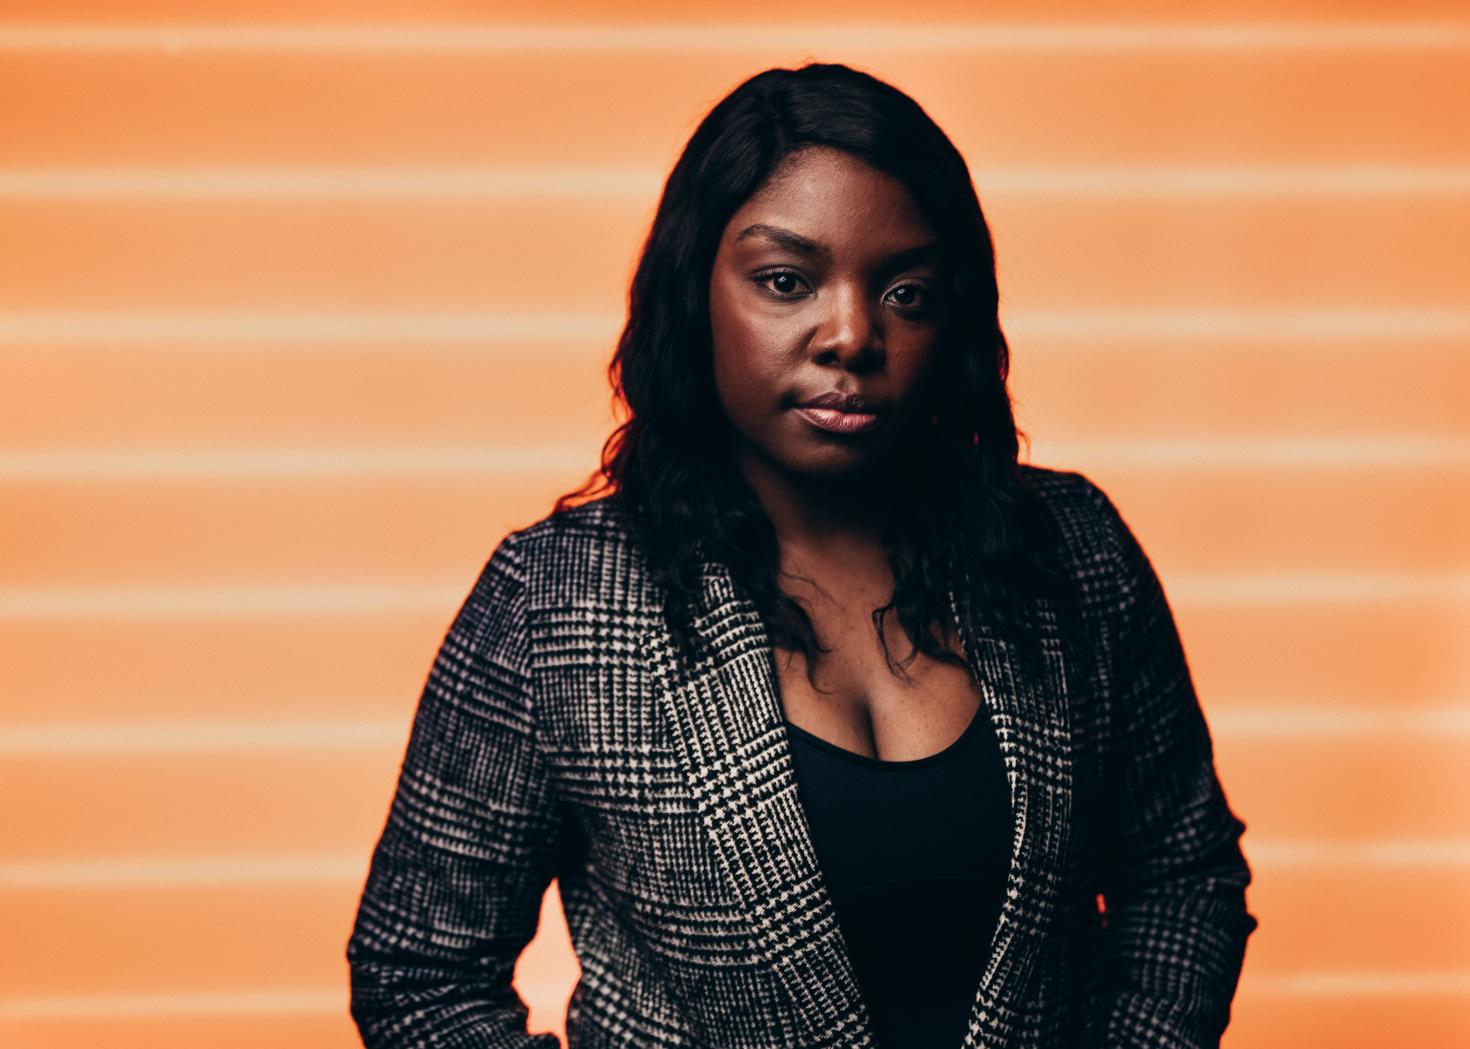 Joaquina Kalukango On Why She Needs To Go On Vacation After Slave